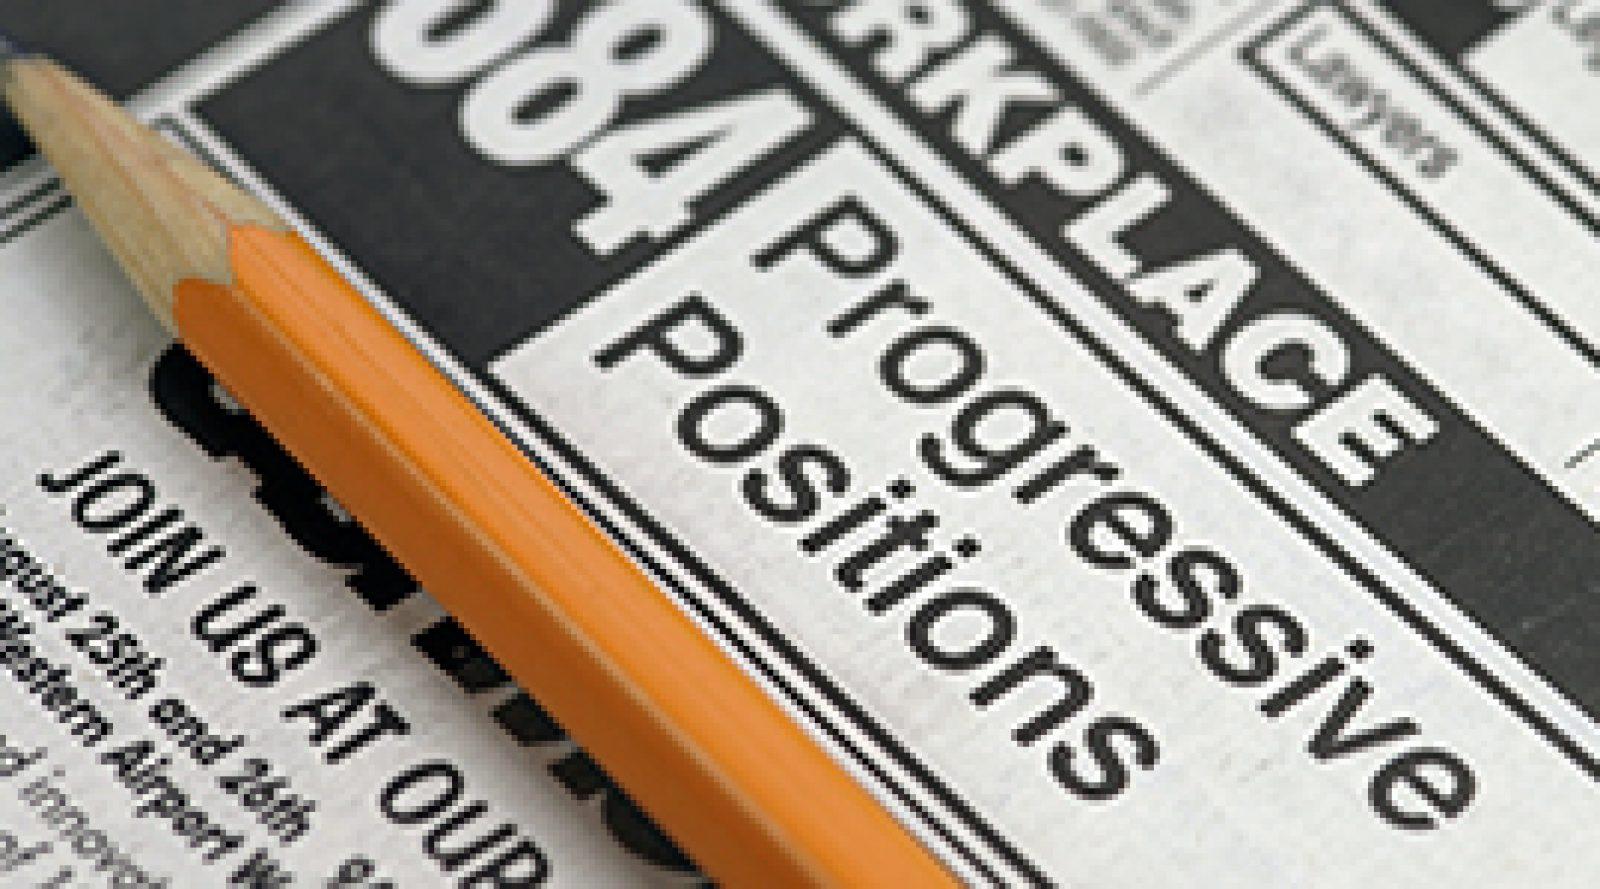 Newspaper - Job search page